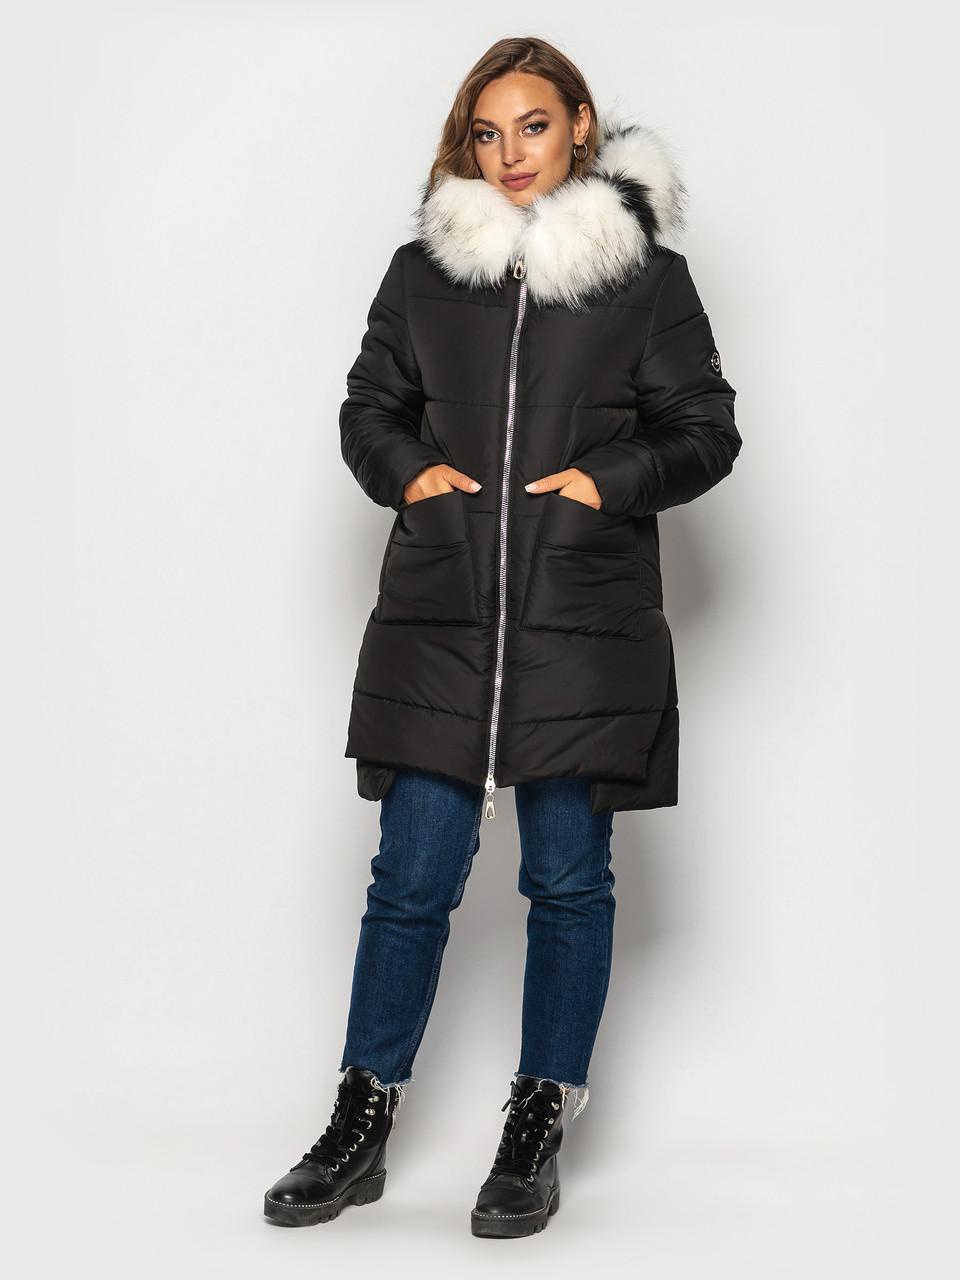 Зимняя куртка К 0079 с 03